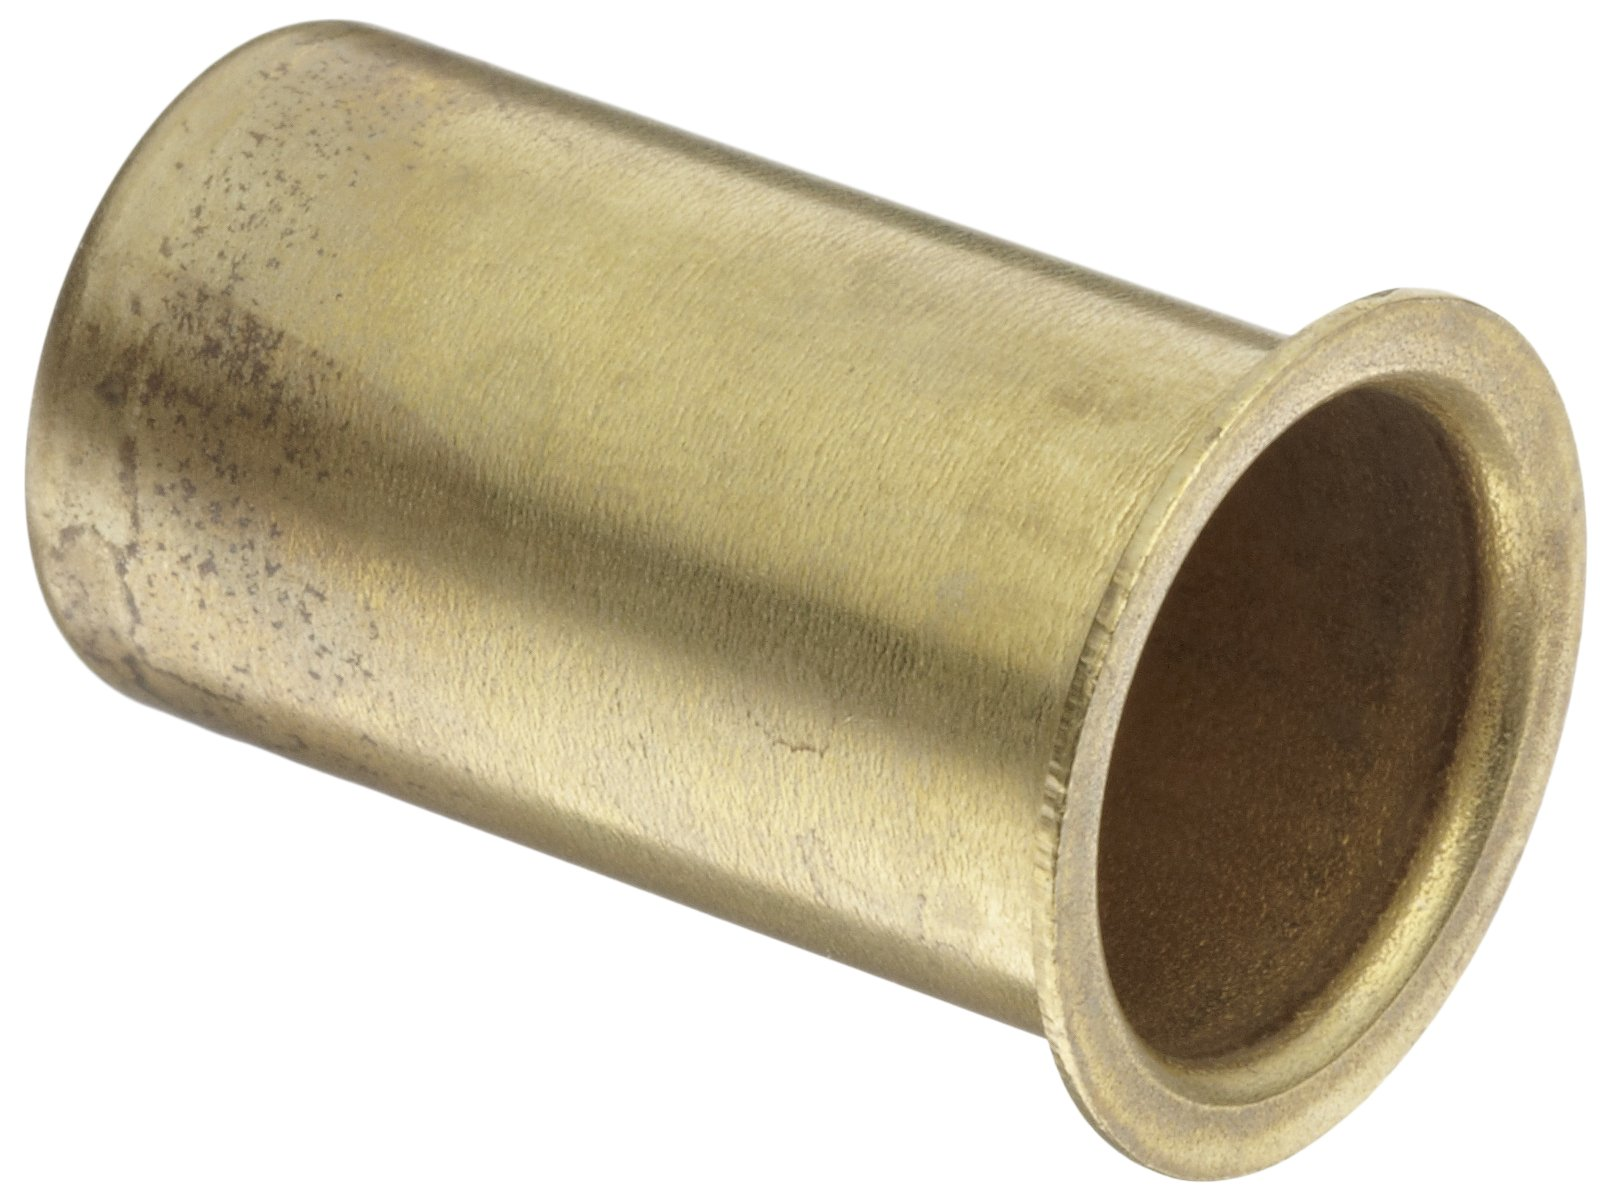 Eaton Weatherhead 2030X12 Tube Support, CA360 Brass, 3/4'' Tube OD, 9/16'' OD (Pack of 10)